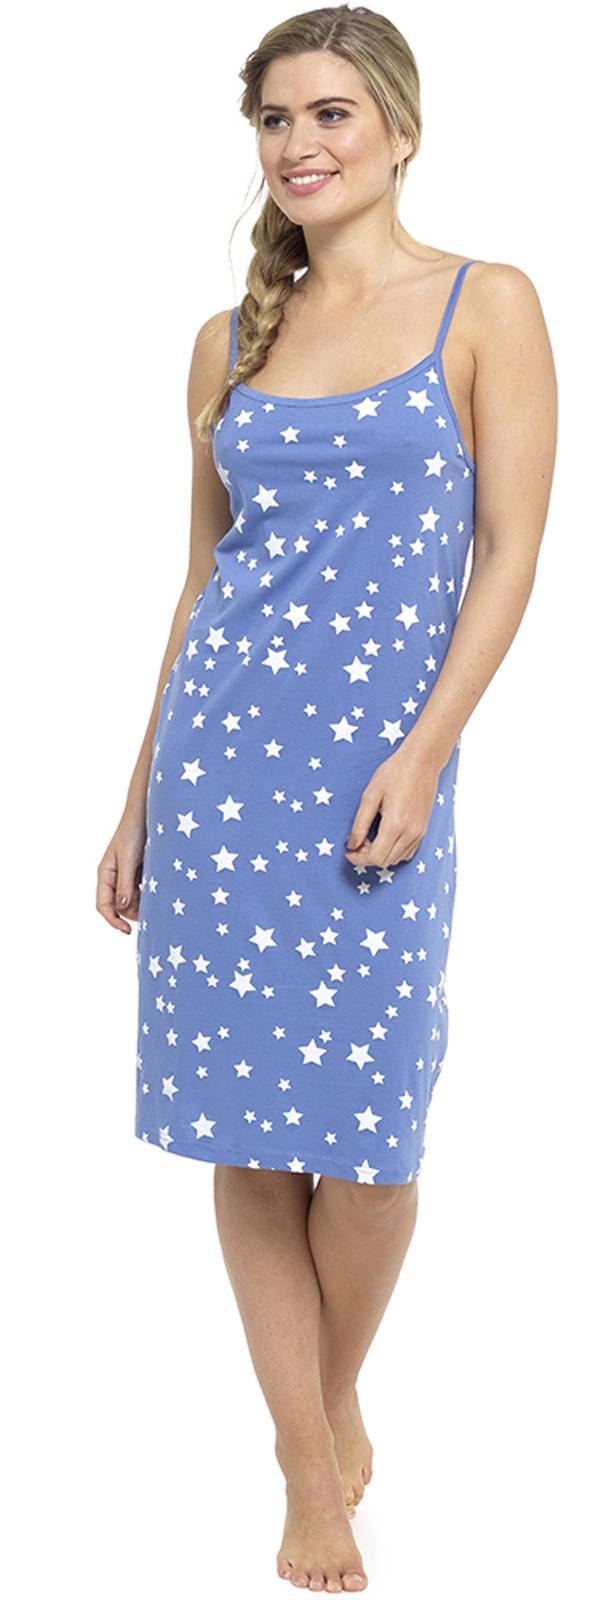 Womens Nightdress Chemise Strappy Nightie 100% Cotton Nightwear Slip ... 374d635964d6